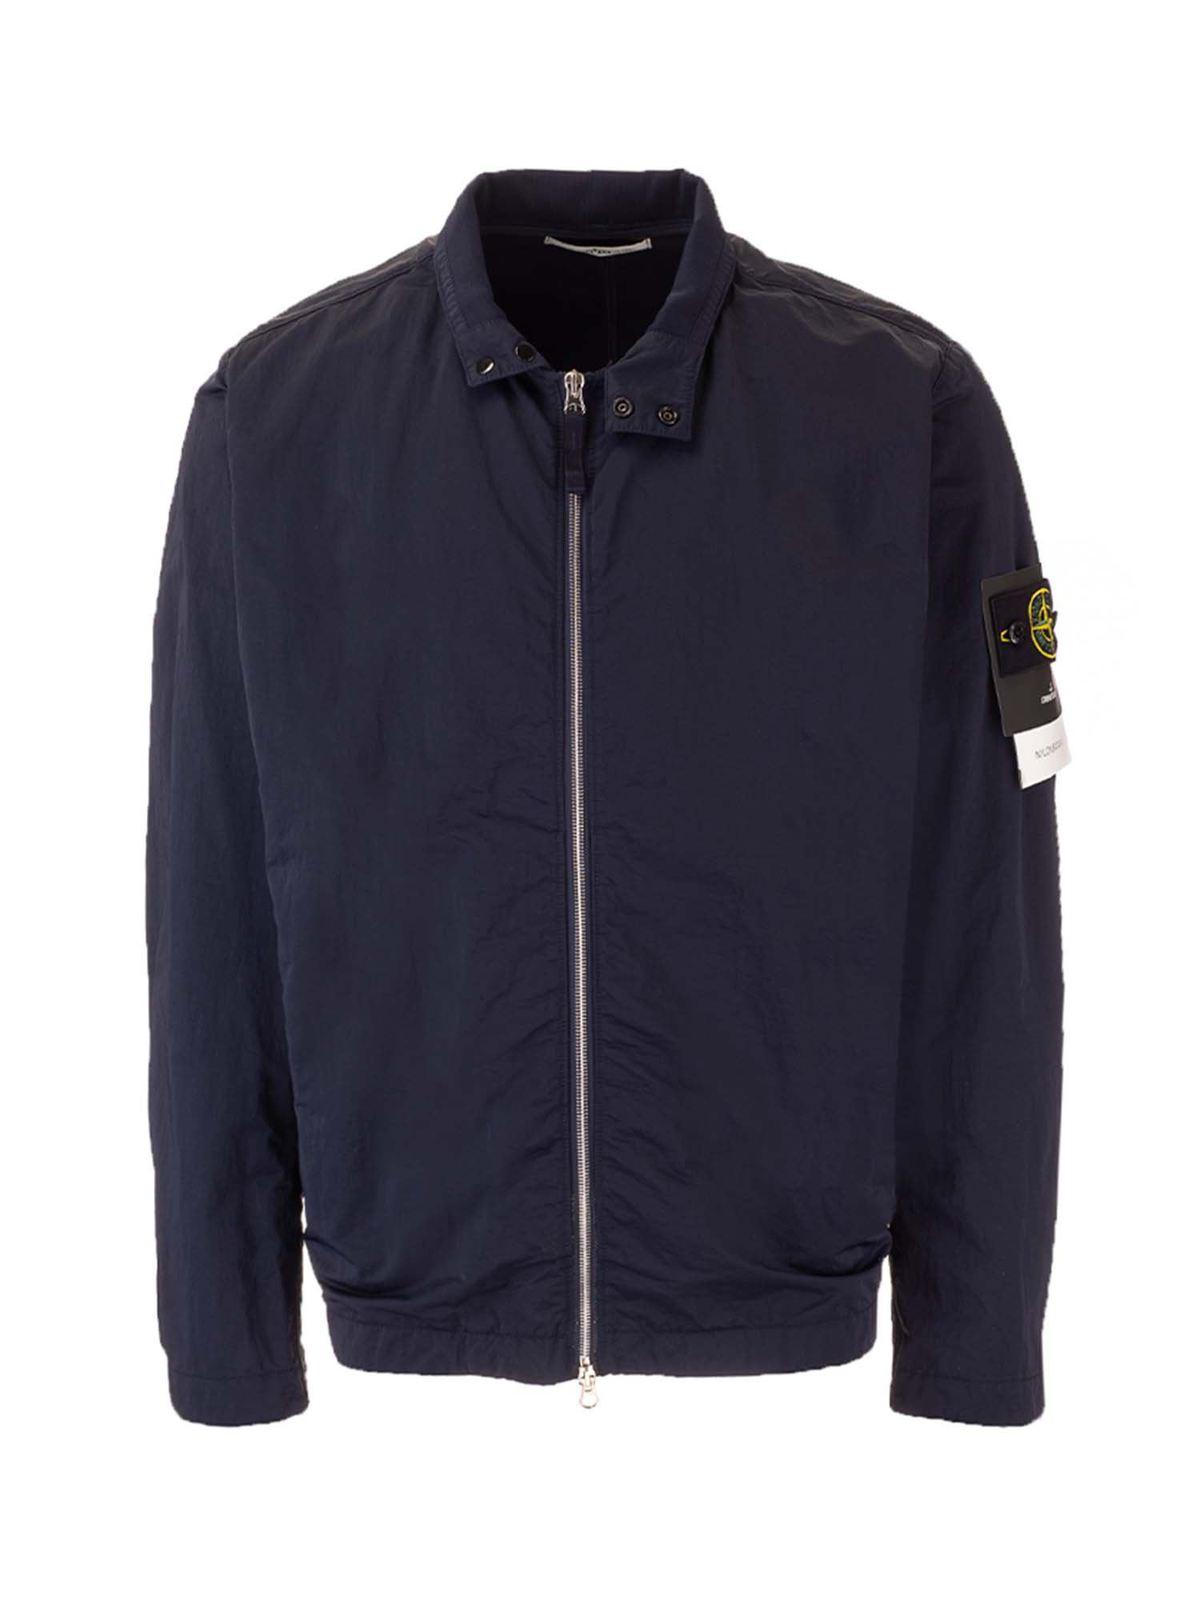 Stone Island Jackets LOGO PATCH JACKET IN BLUE